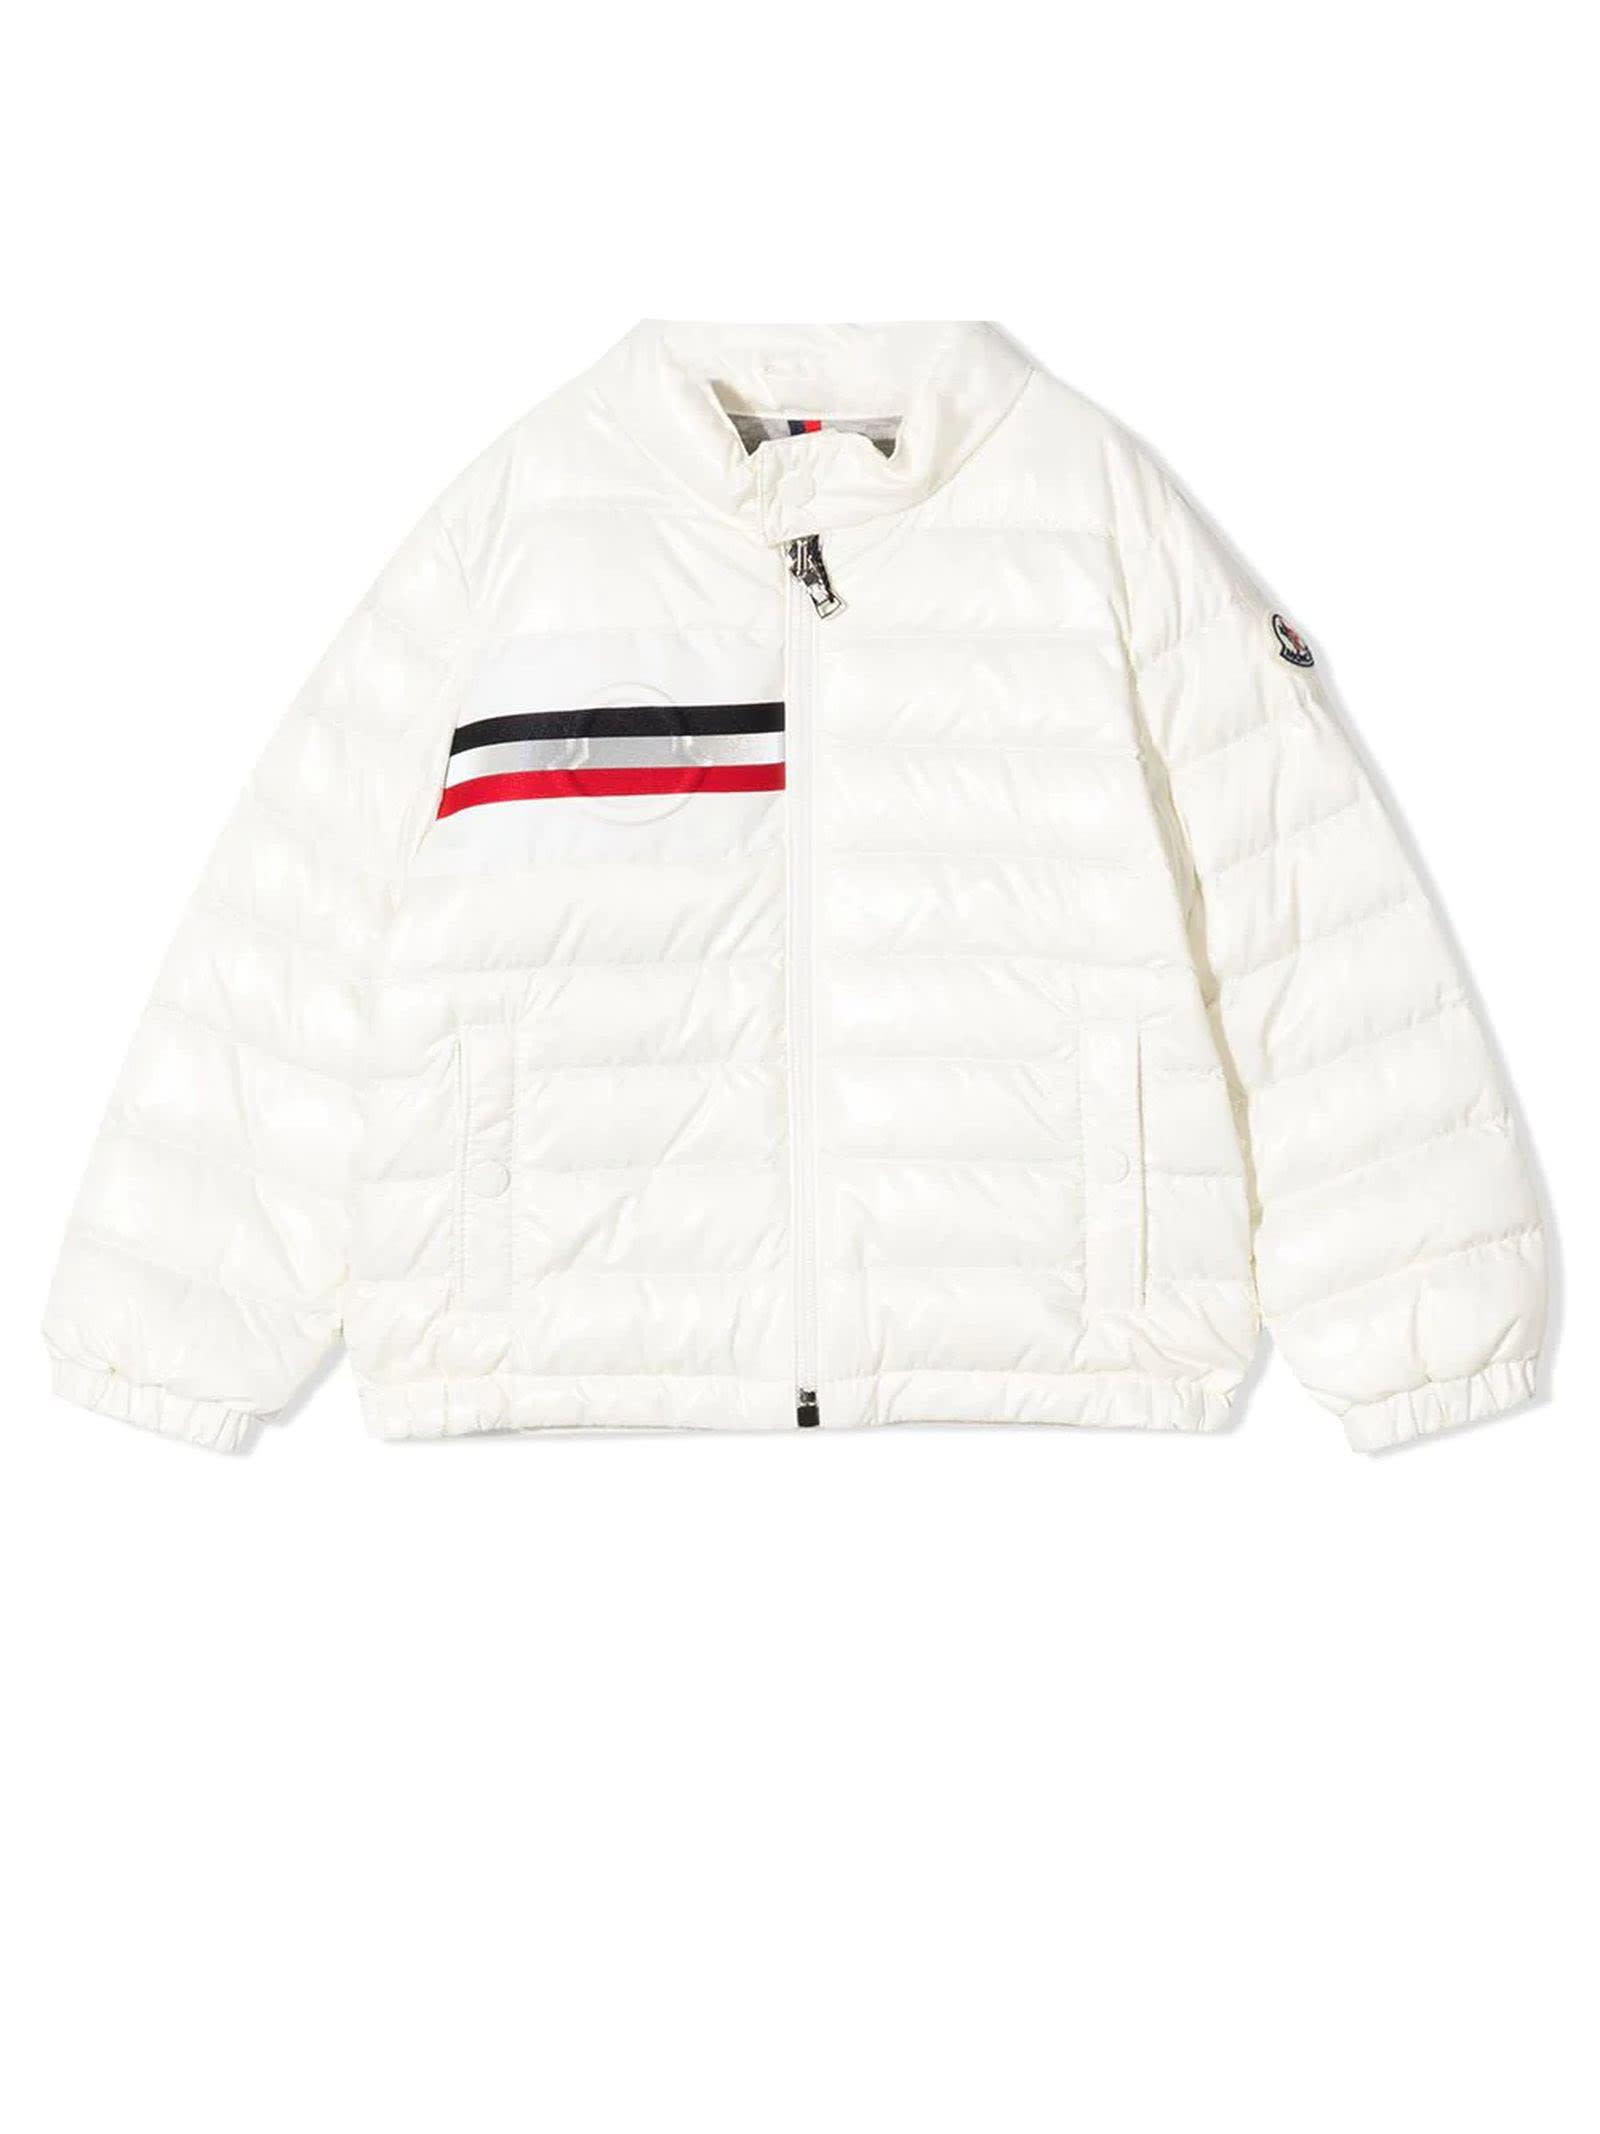 Moncler White Feather Down Jacket